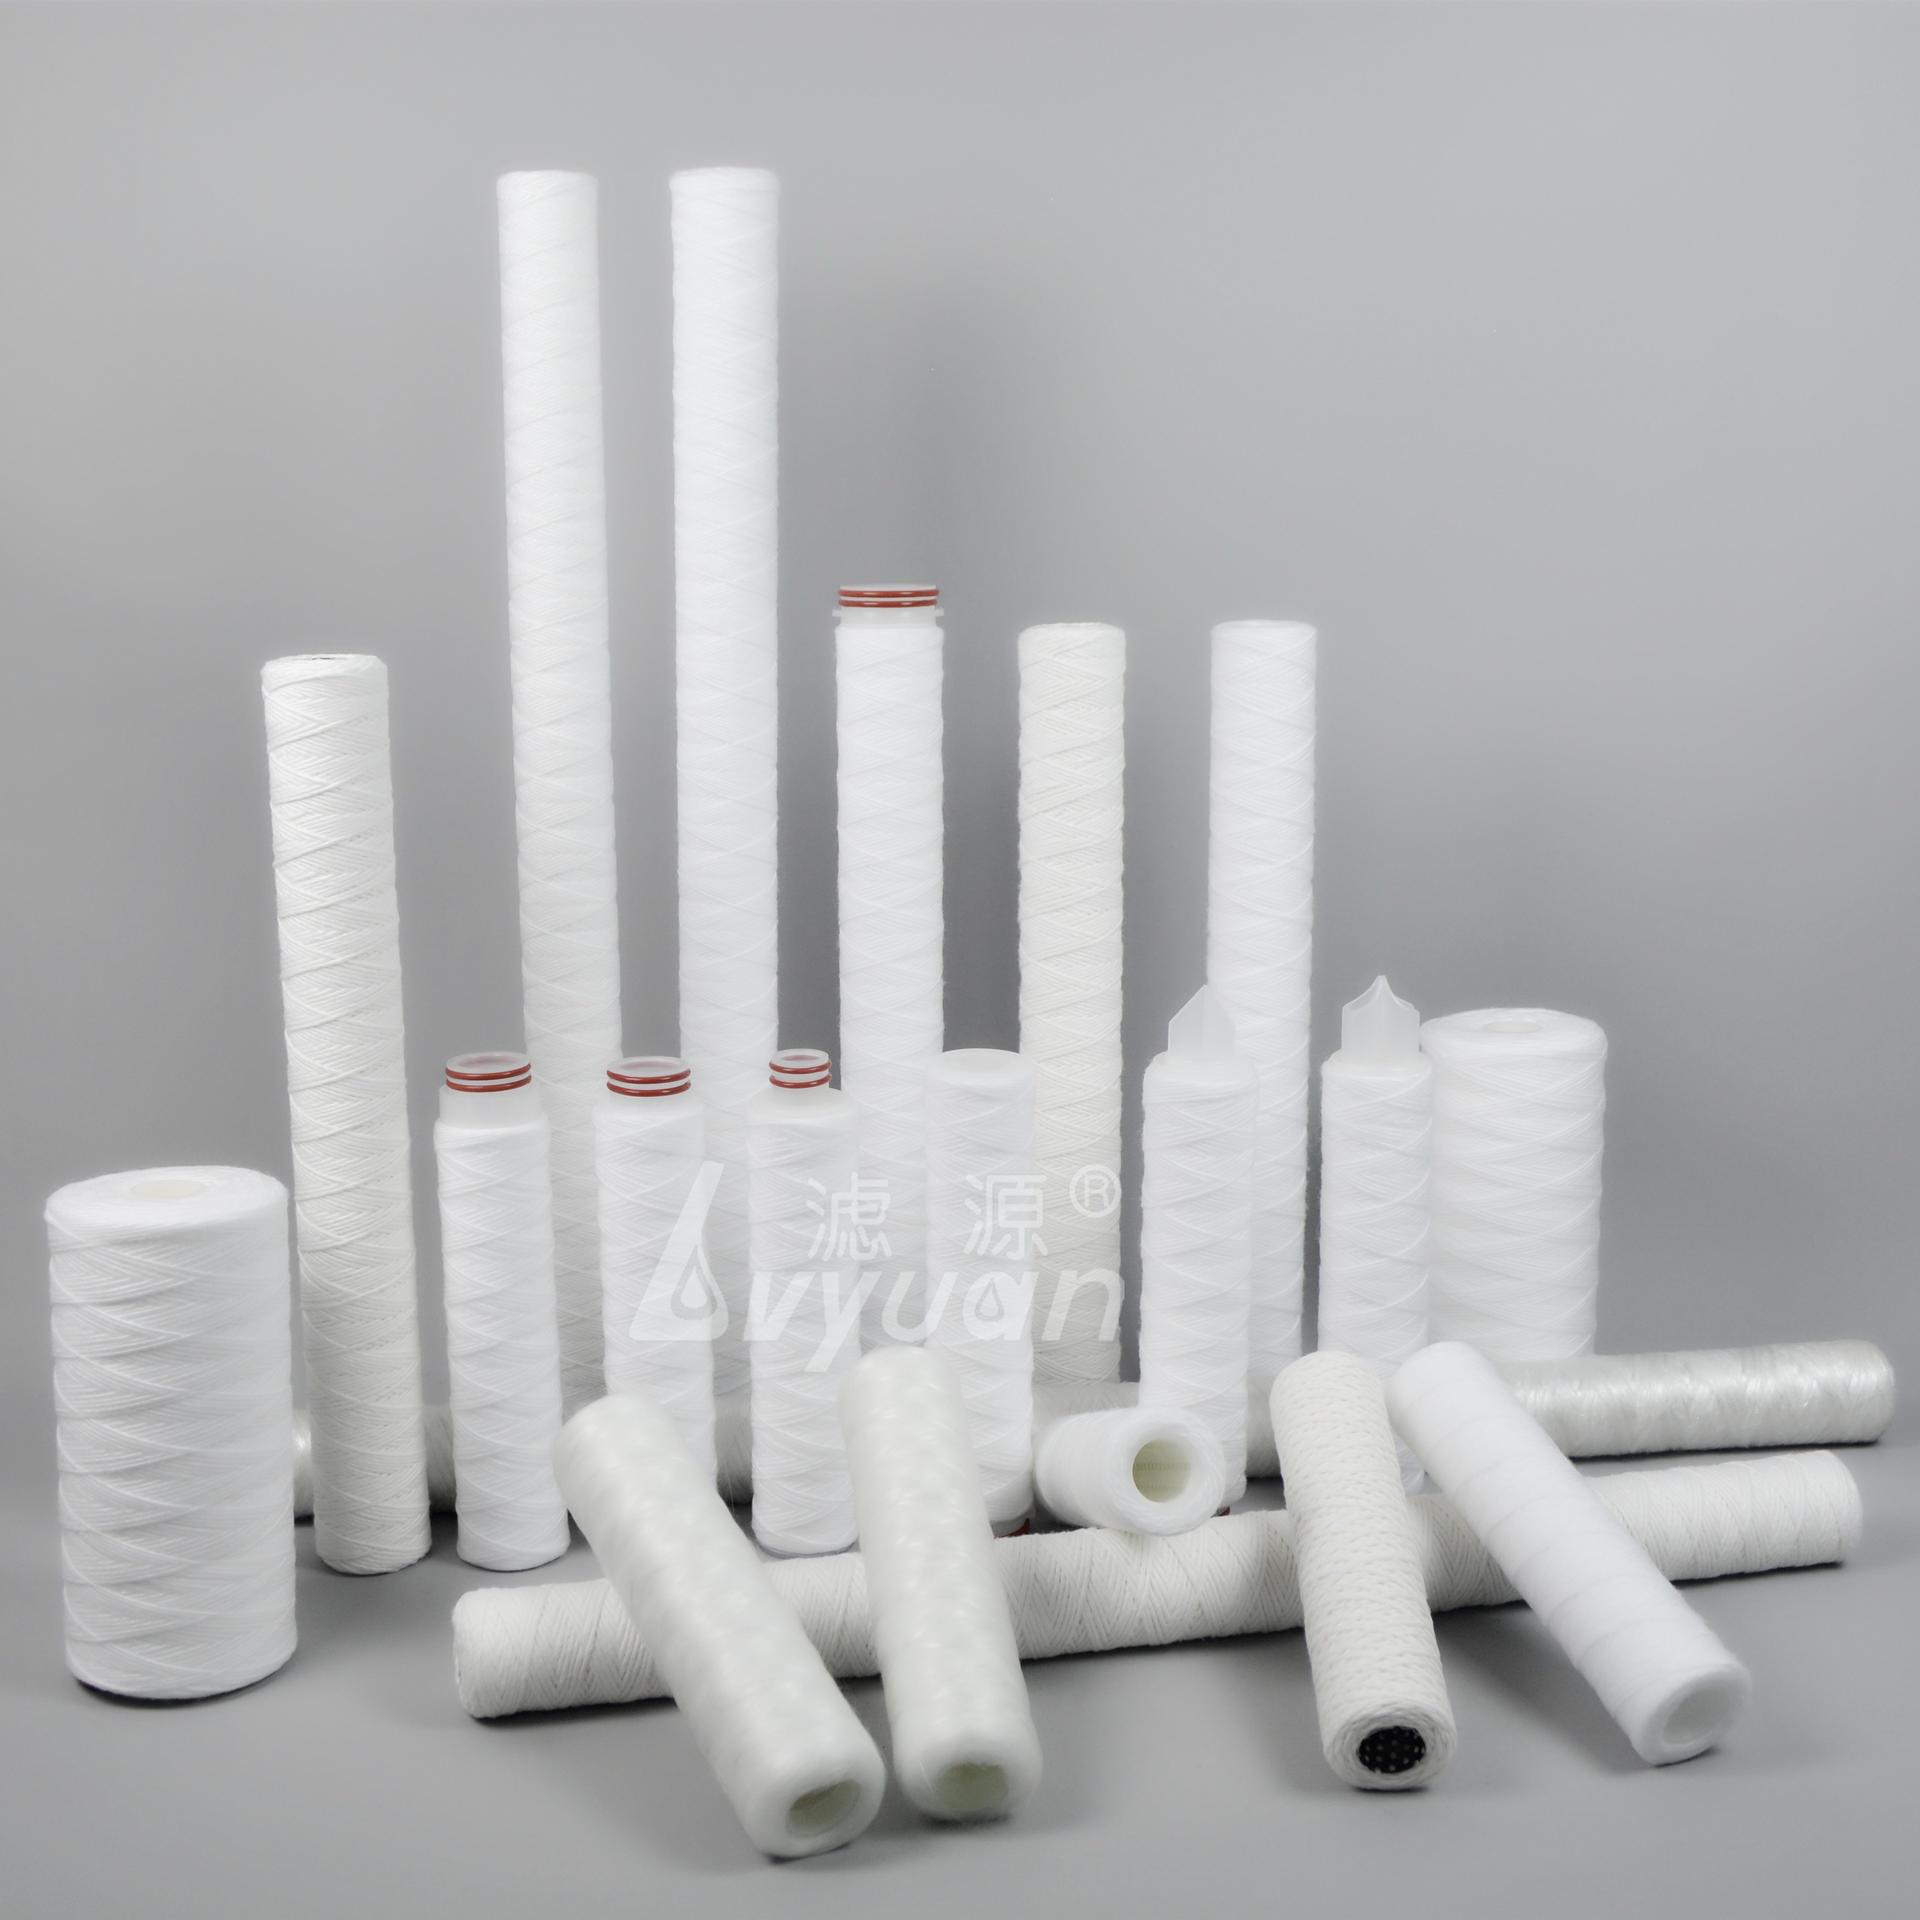 5 micron spun polypropylene water filter cartridge/string wound filter for juice/coffee filtration